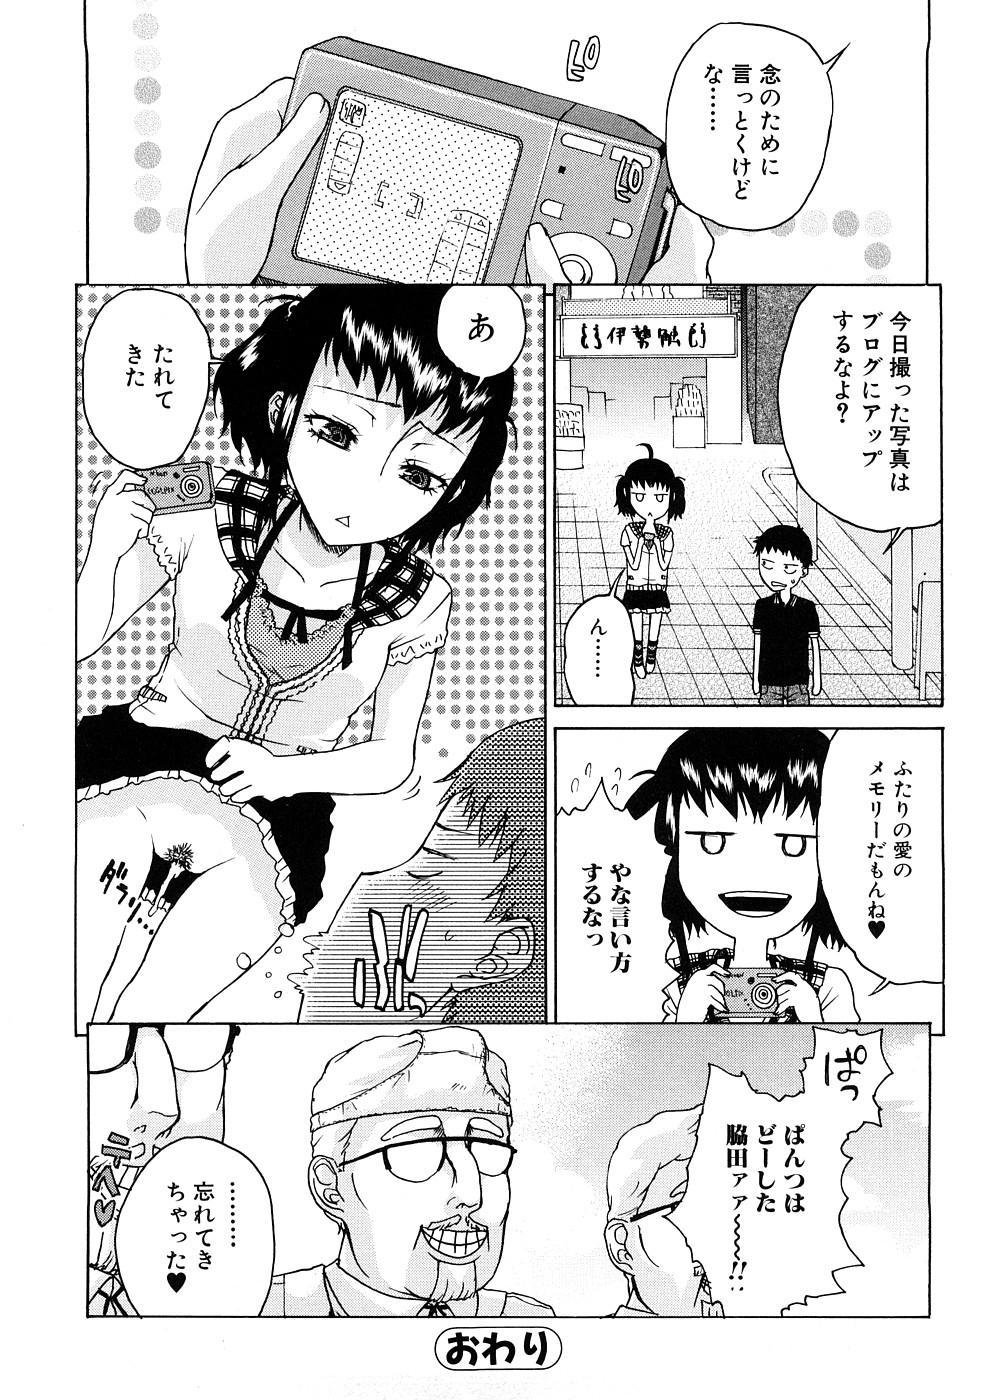 Ecchi de Jibunkatte de Kawaii Ko 35